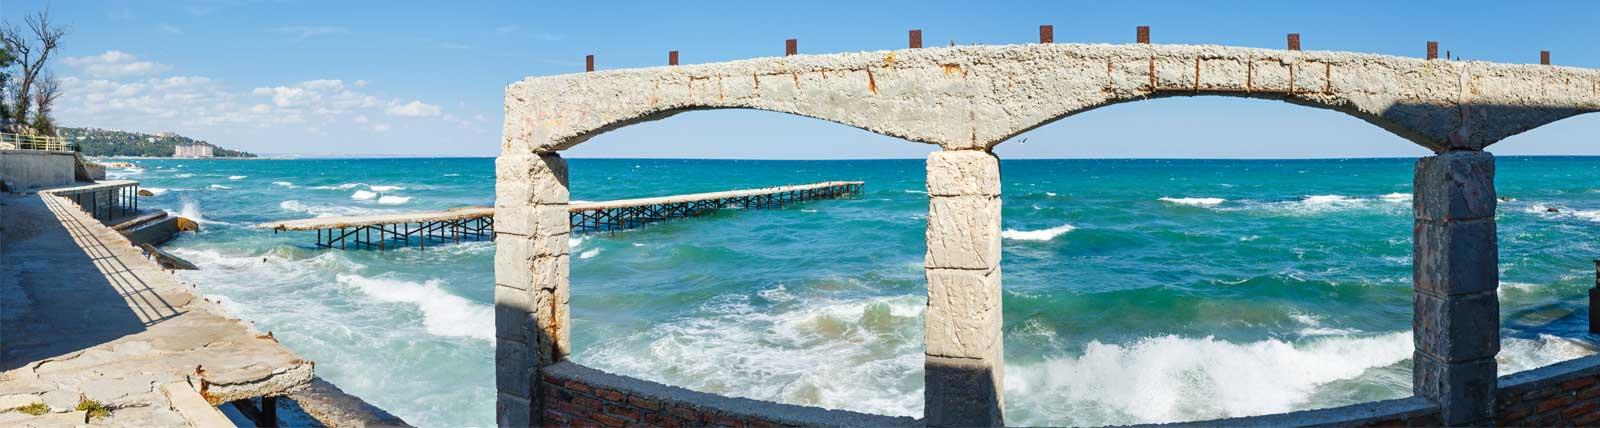 Ferienwohnung Bulgarien, Nordosten Bulgariens, Schwarzen Meer, Topola